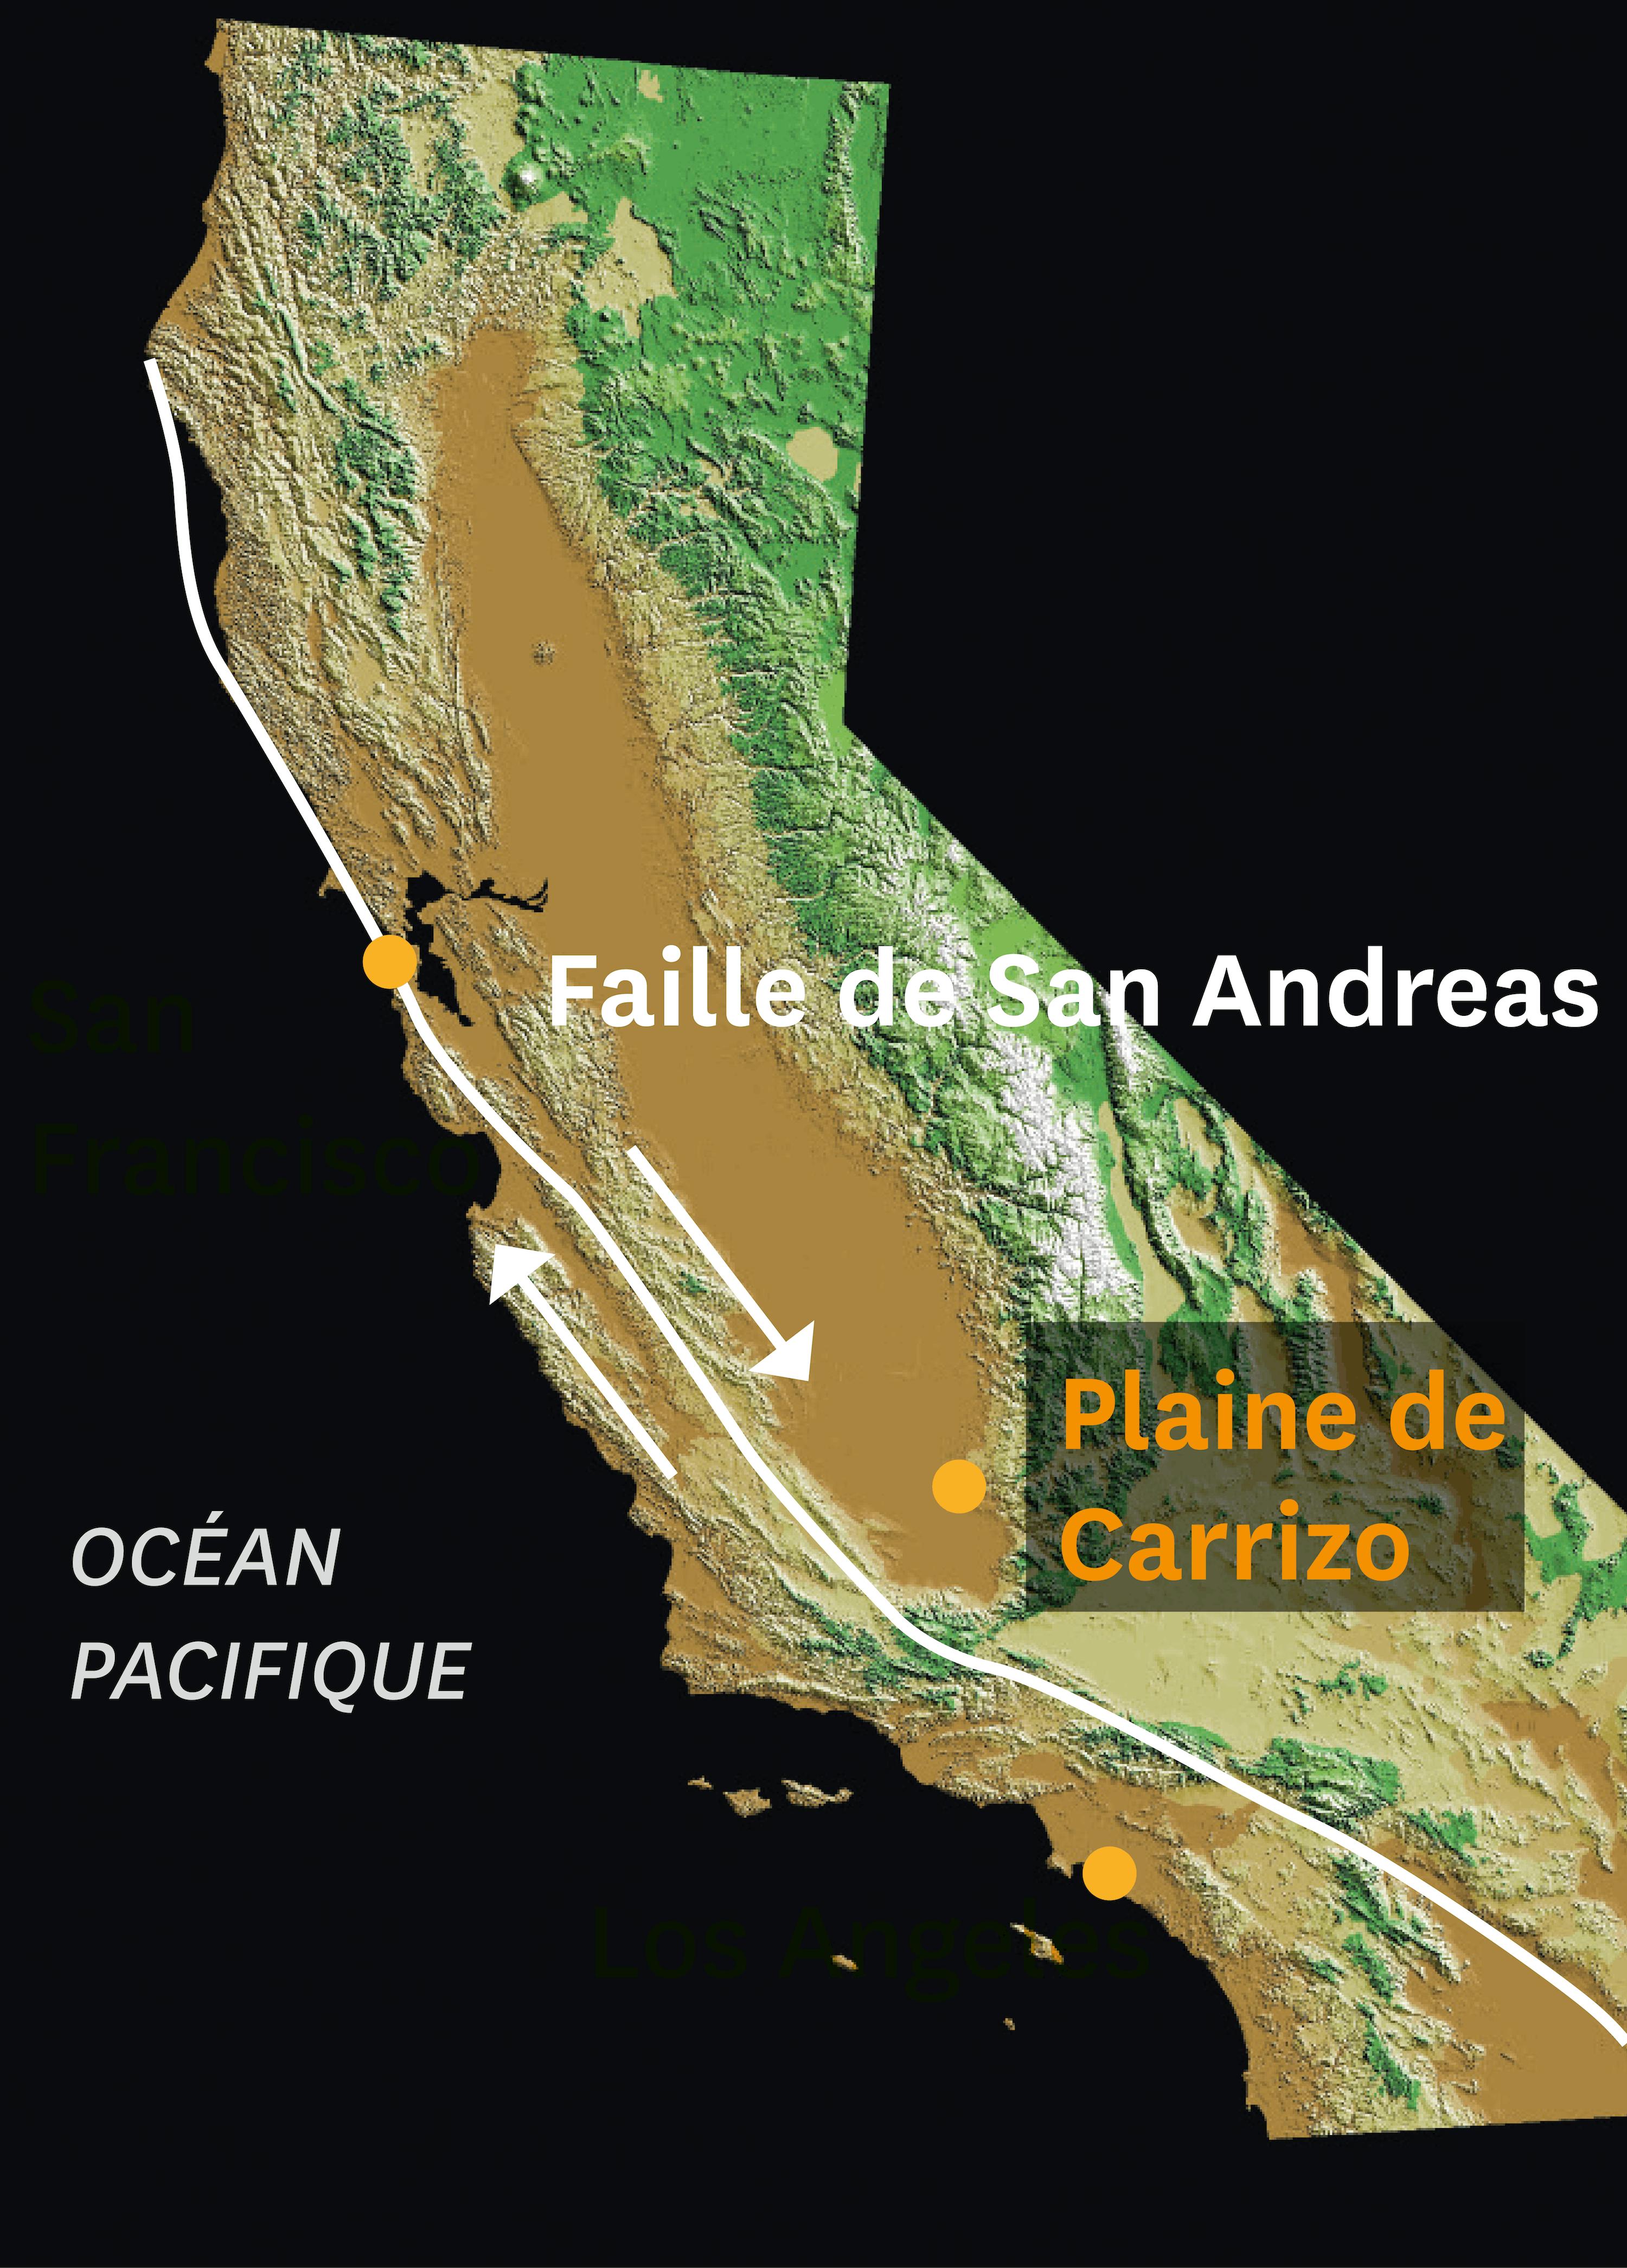 <stamp theme='svt-green1'>Doc. 1</stamp> Image satellitaire montrant la faille de San Andreas.